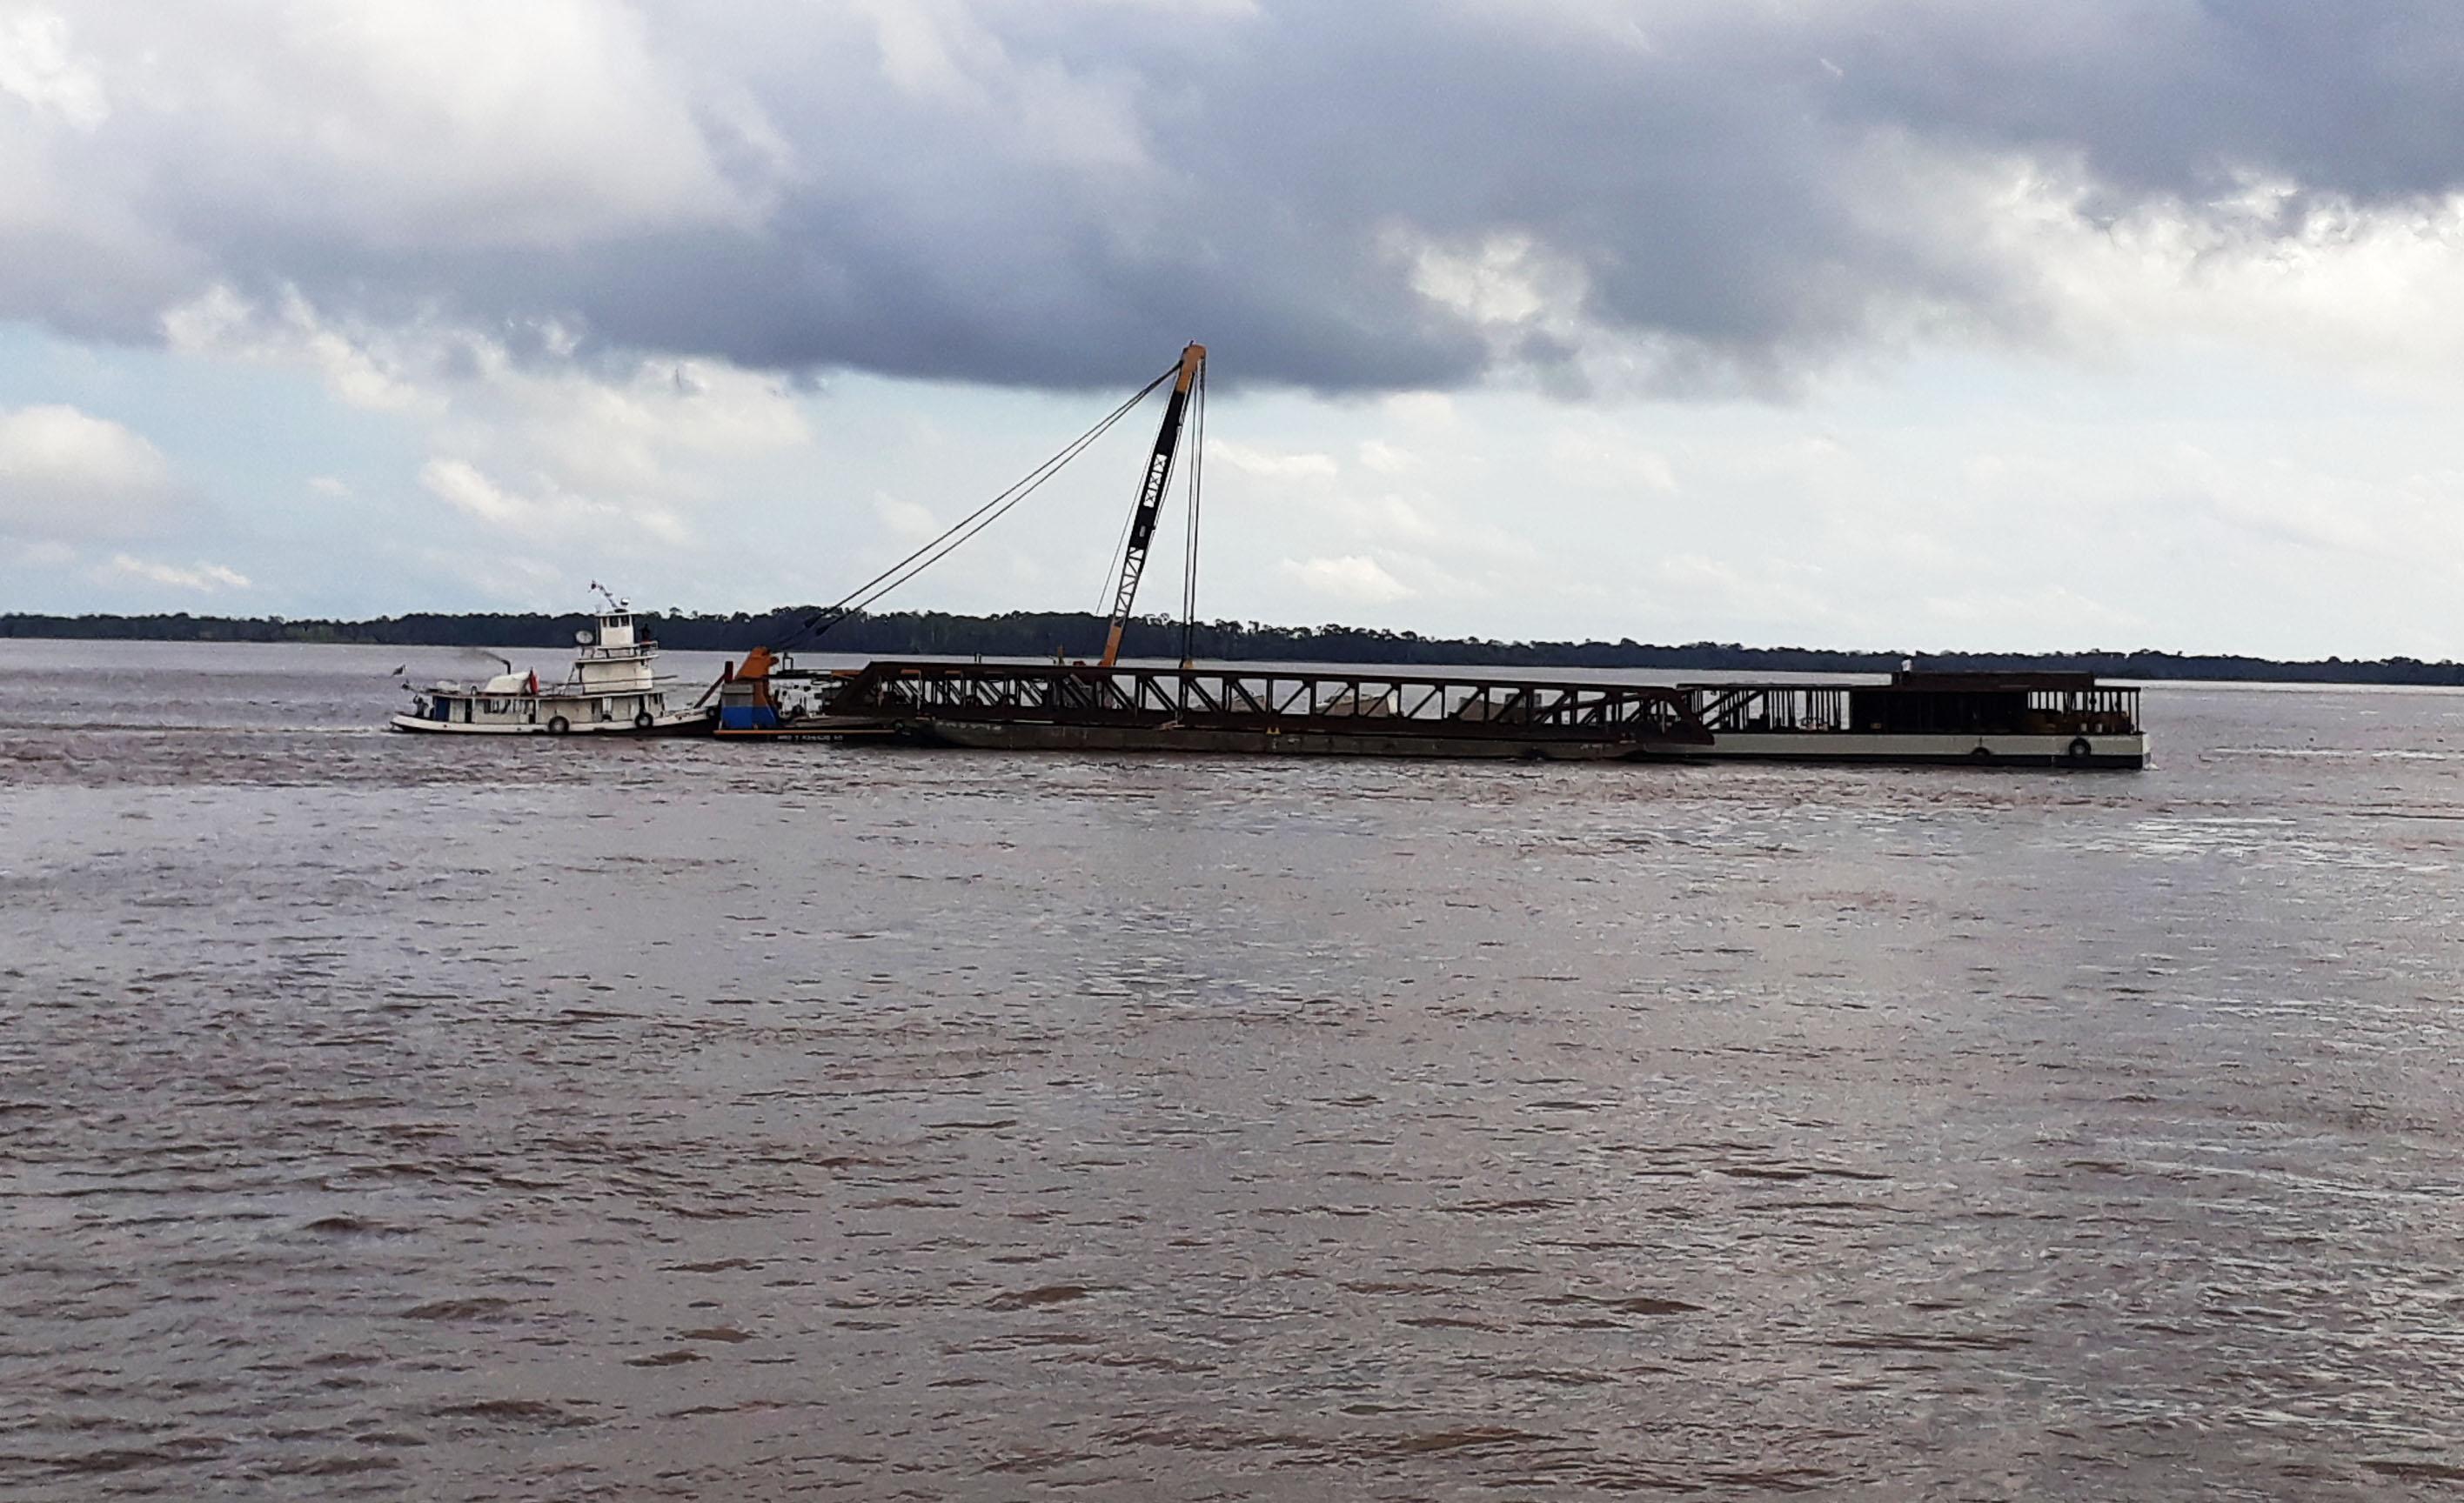 Porto Flutuante de Vila Amazônia 12-07-2019 (Josiete Serrão) (58)